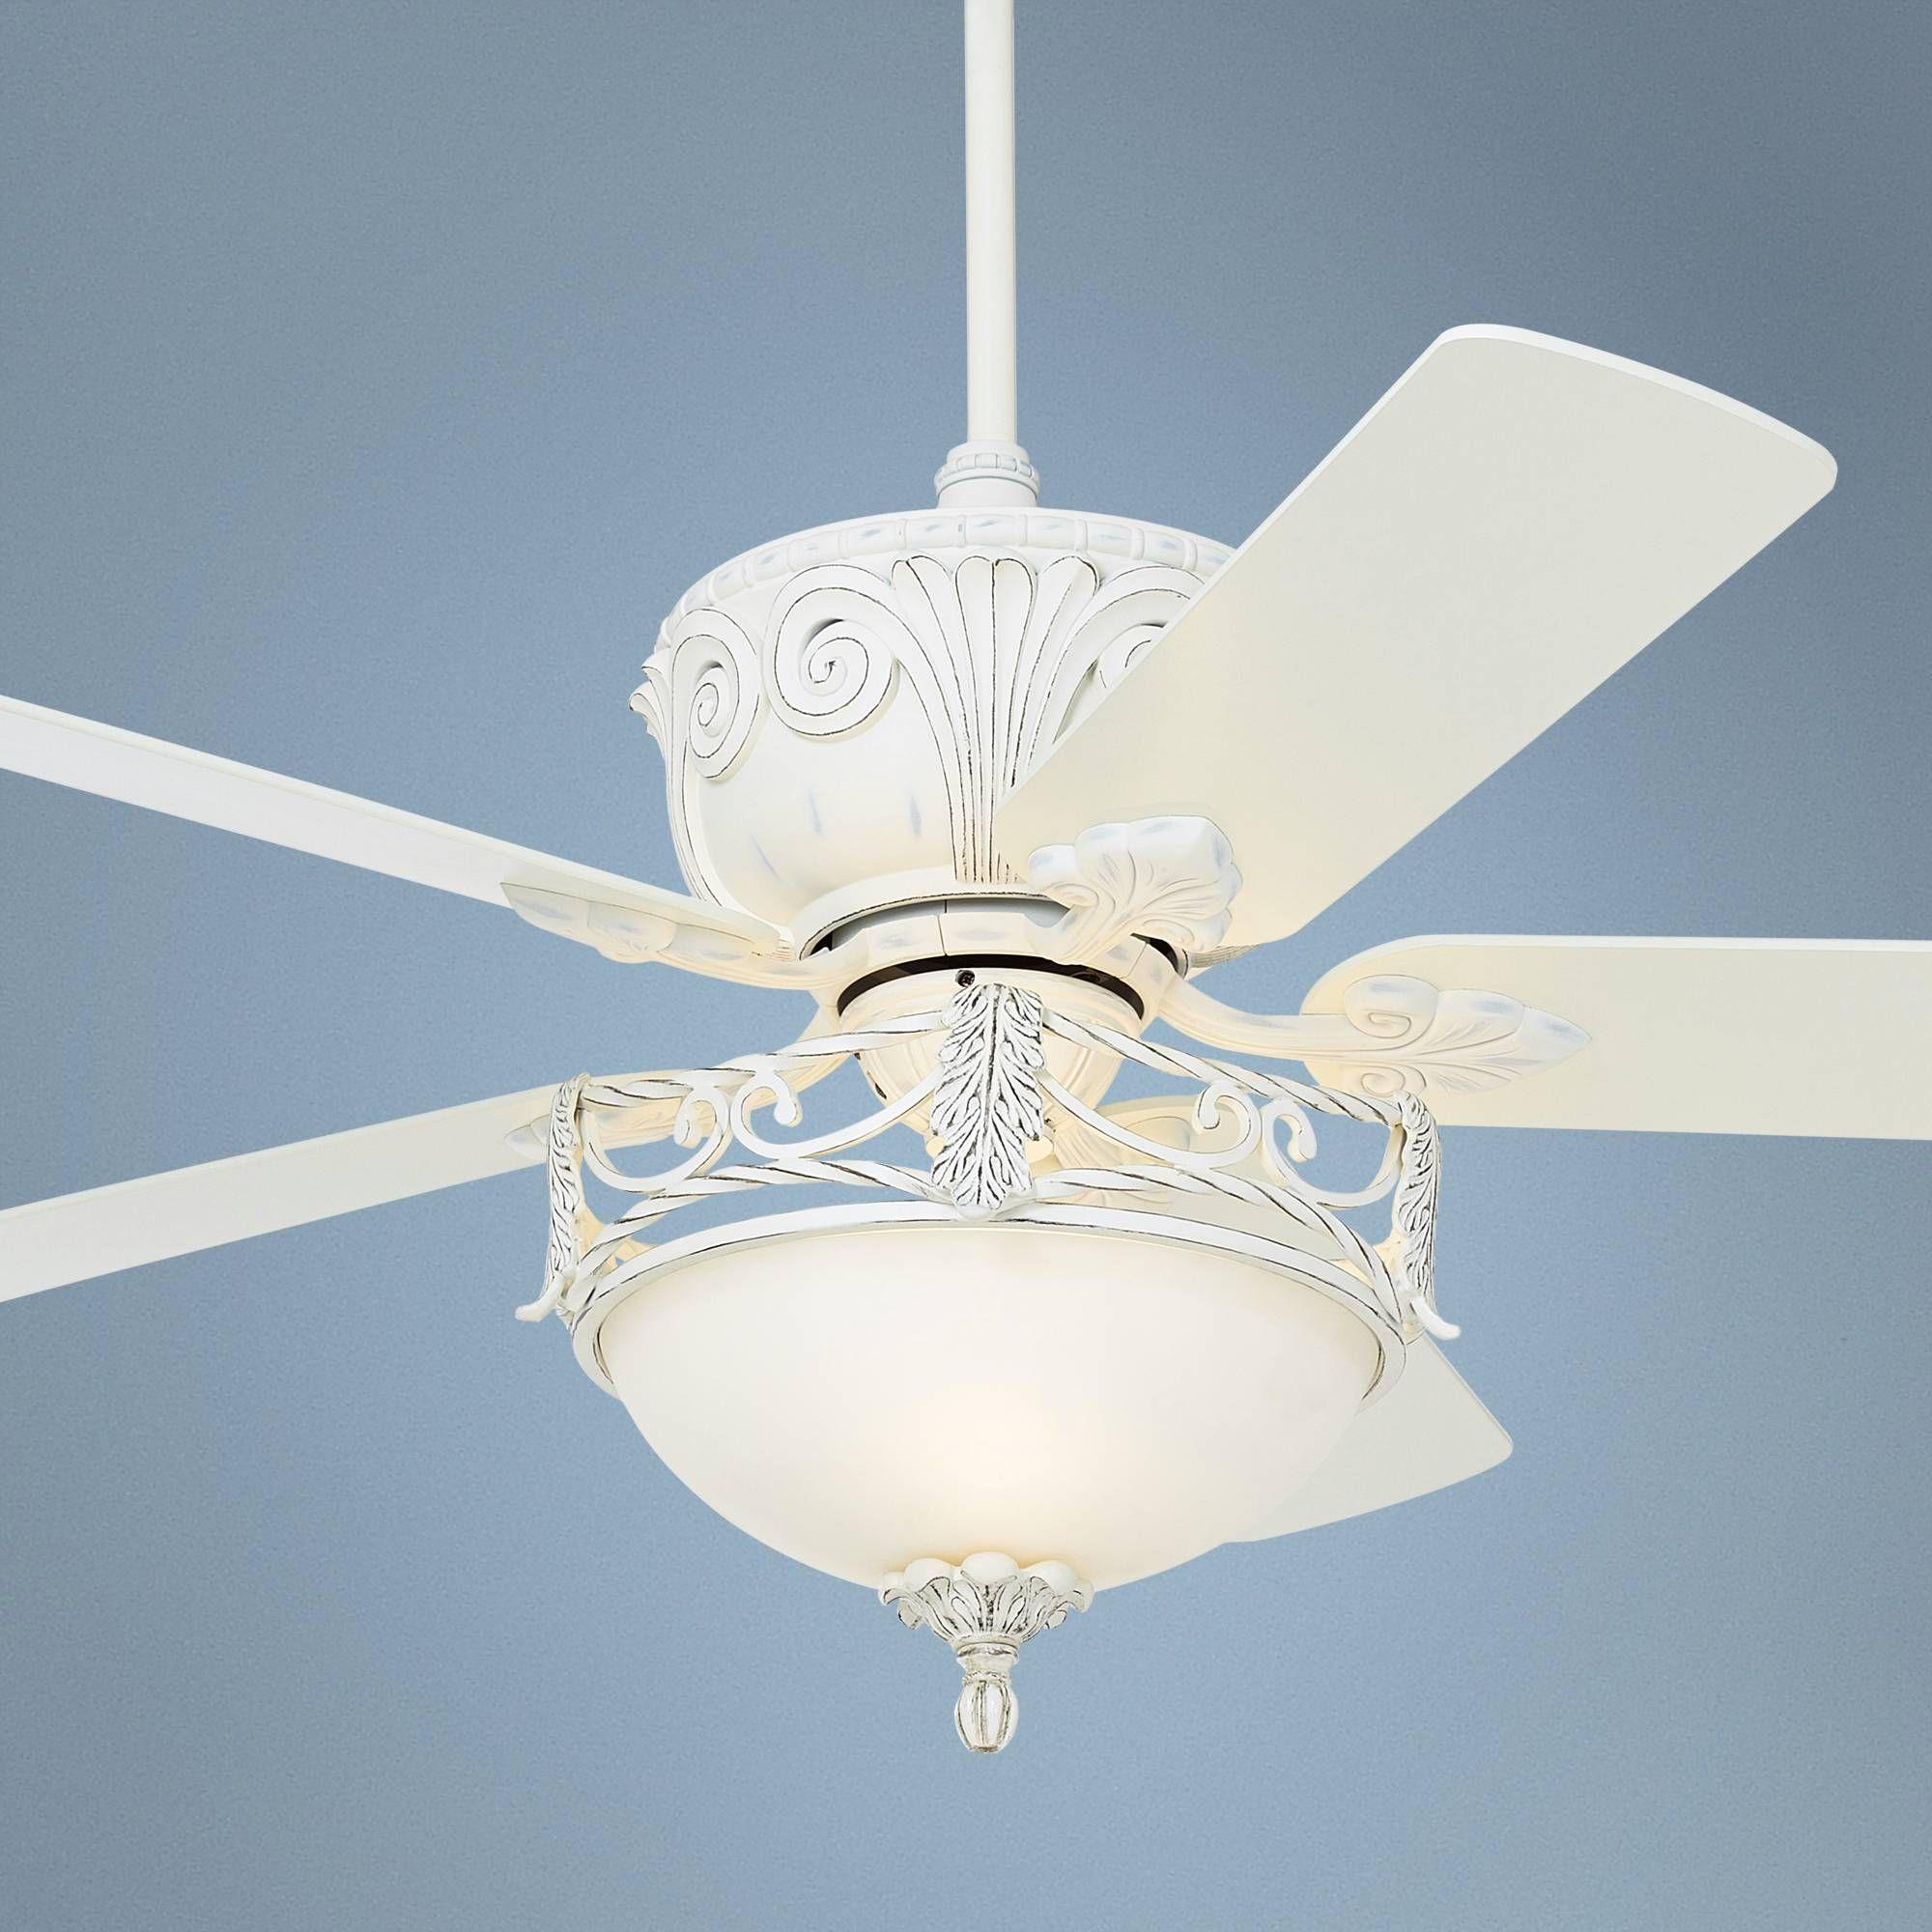 fans plus with white lamps fan pin rubbed casa deville light ceiling